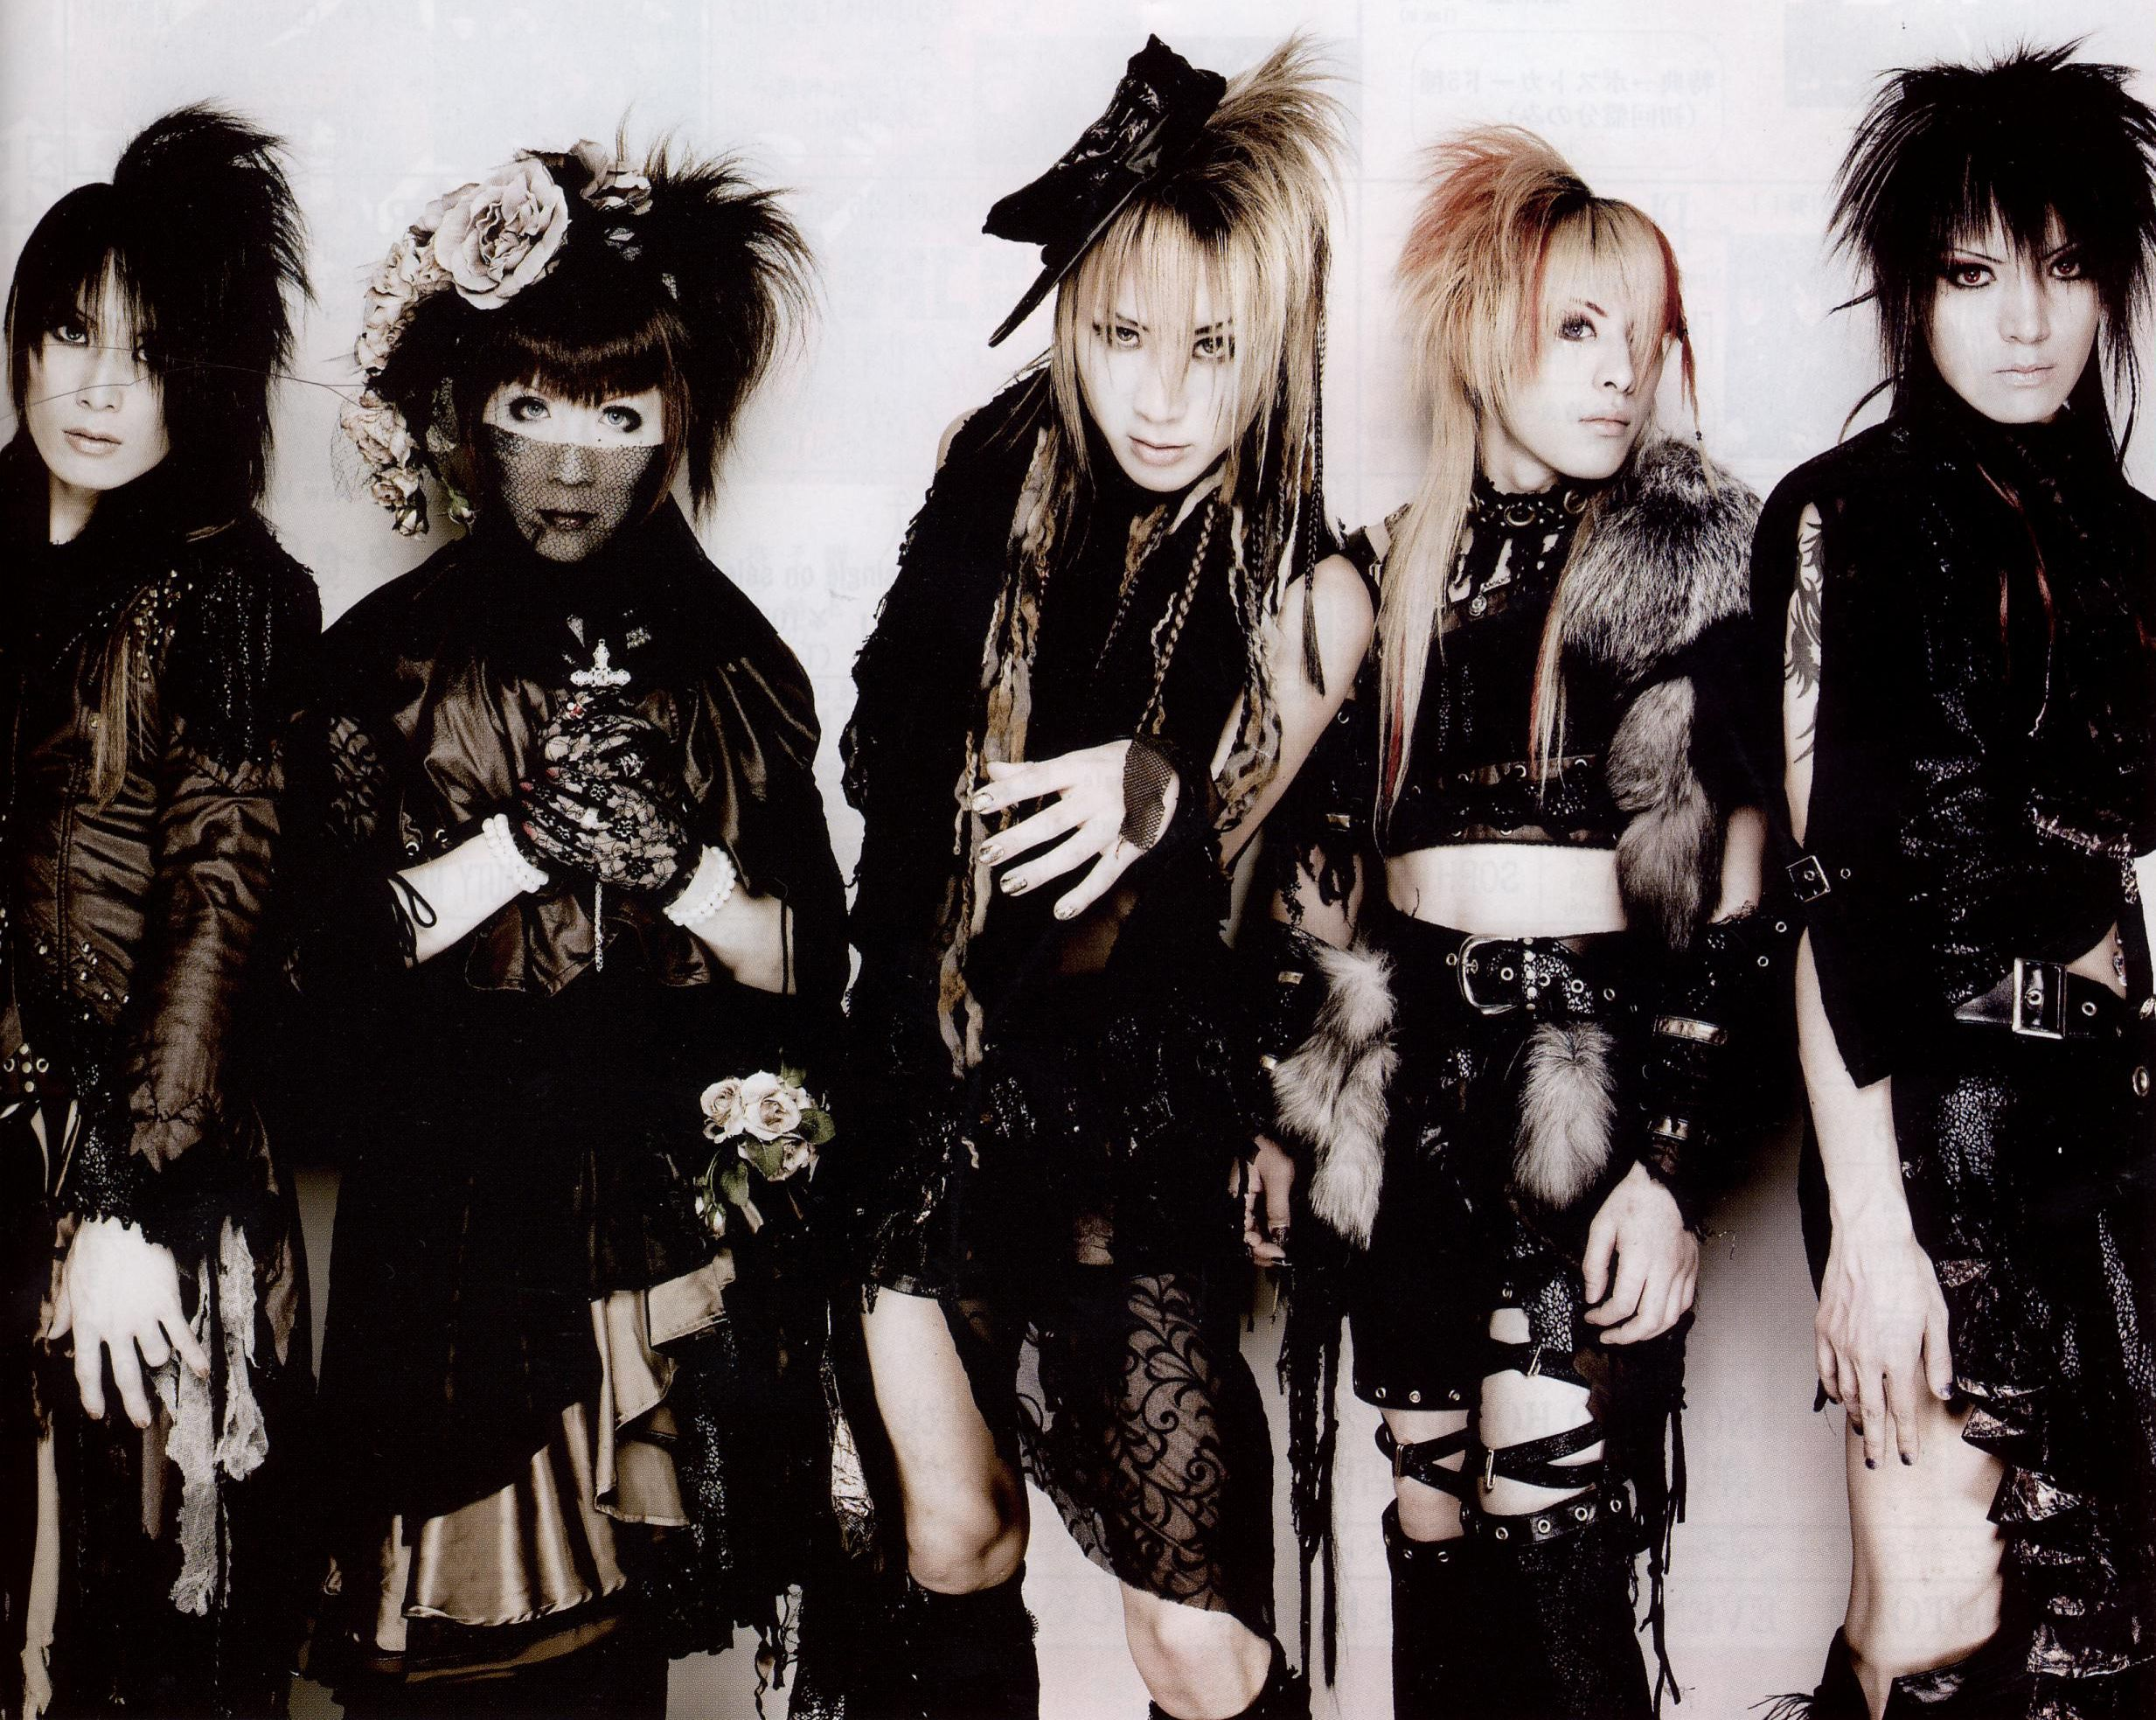 Download Vidoll: Deathmate: Group (2466x1967) - Minitokyo